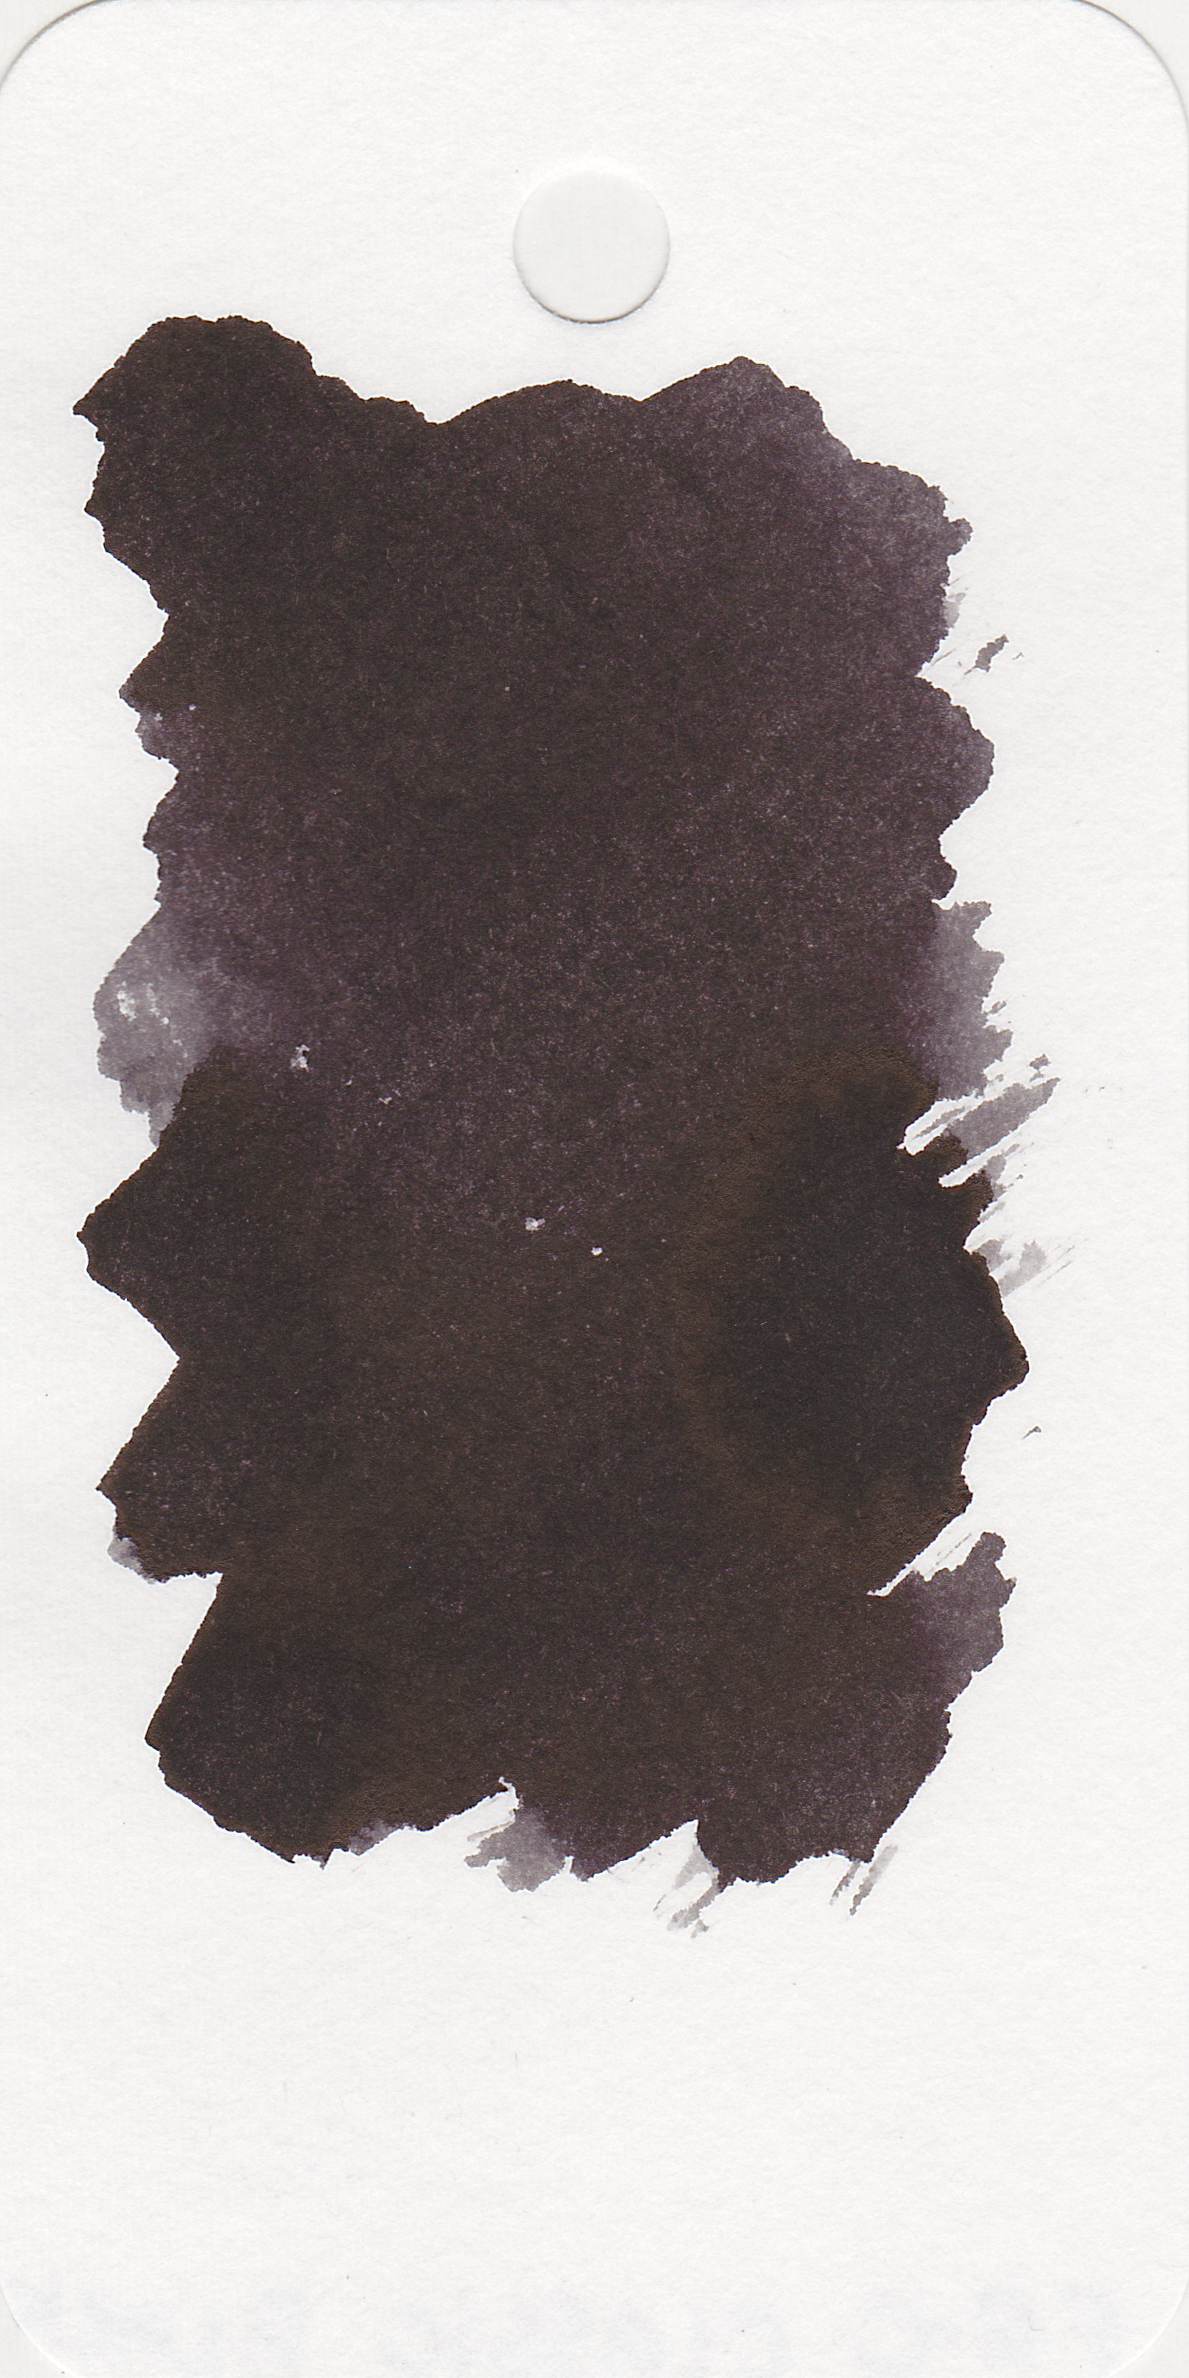 cv-sunspot-3.jpg